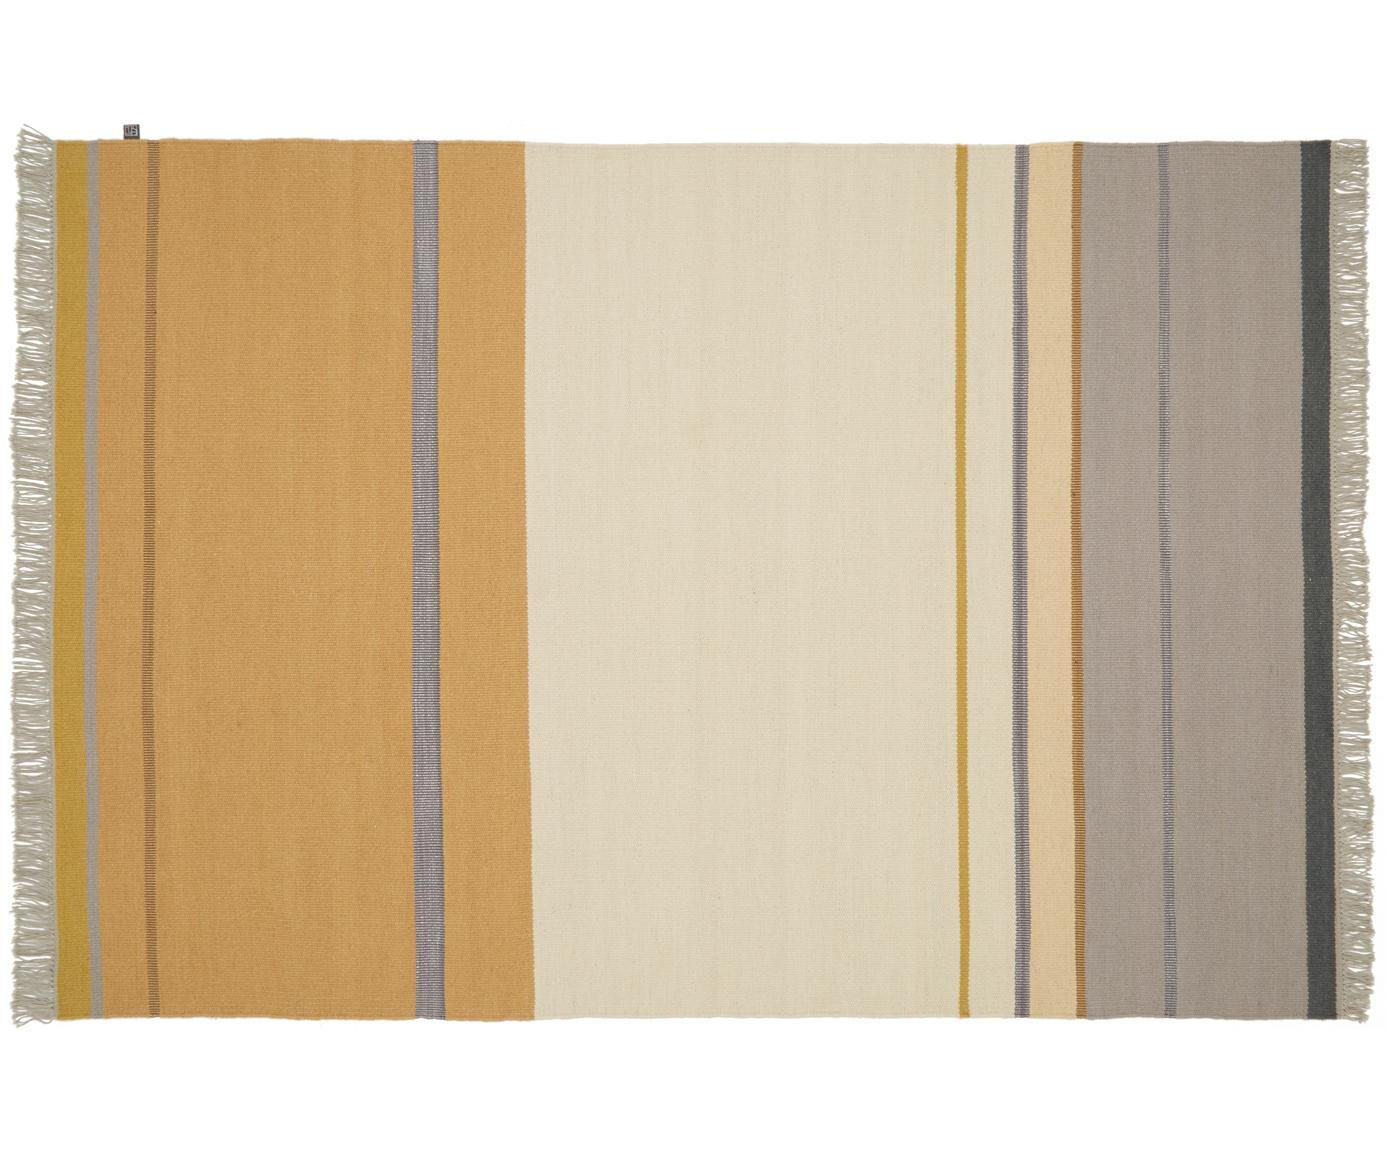 Alfombra artesanal de lana con flecos Metallum, Multicolor, An 140 x L 200 cm (Tamaño S)